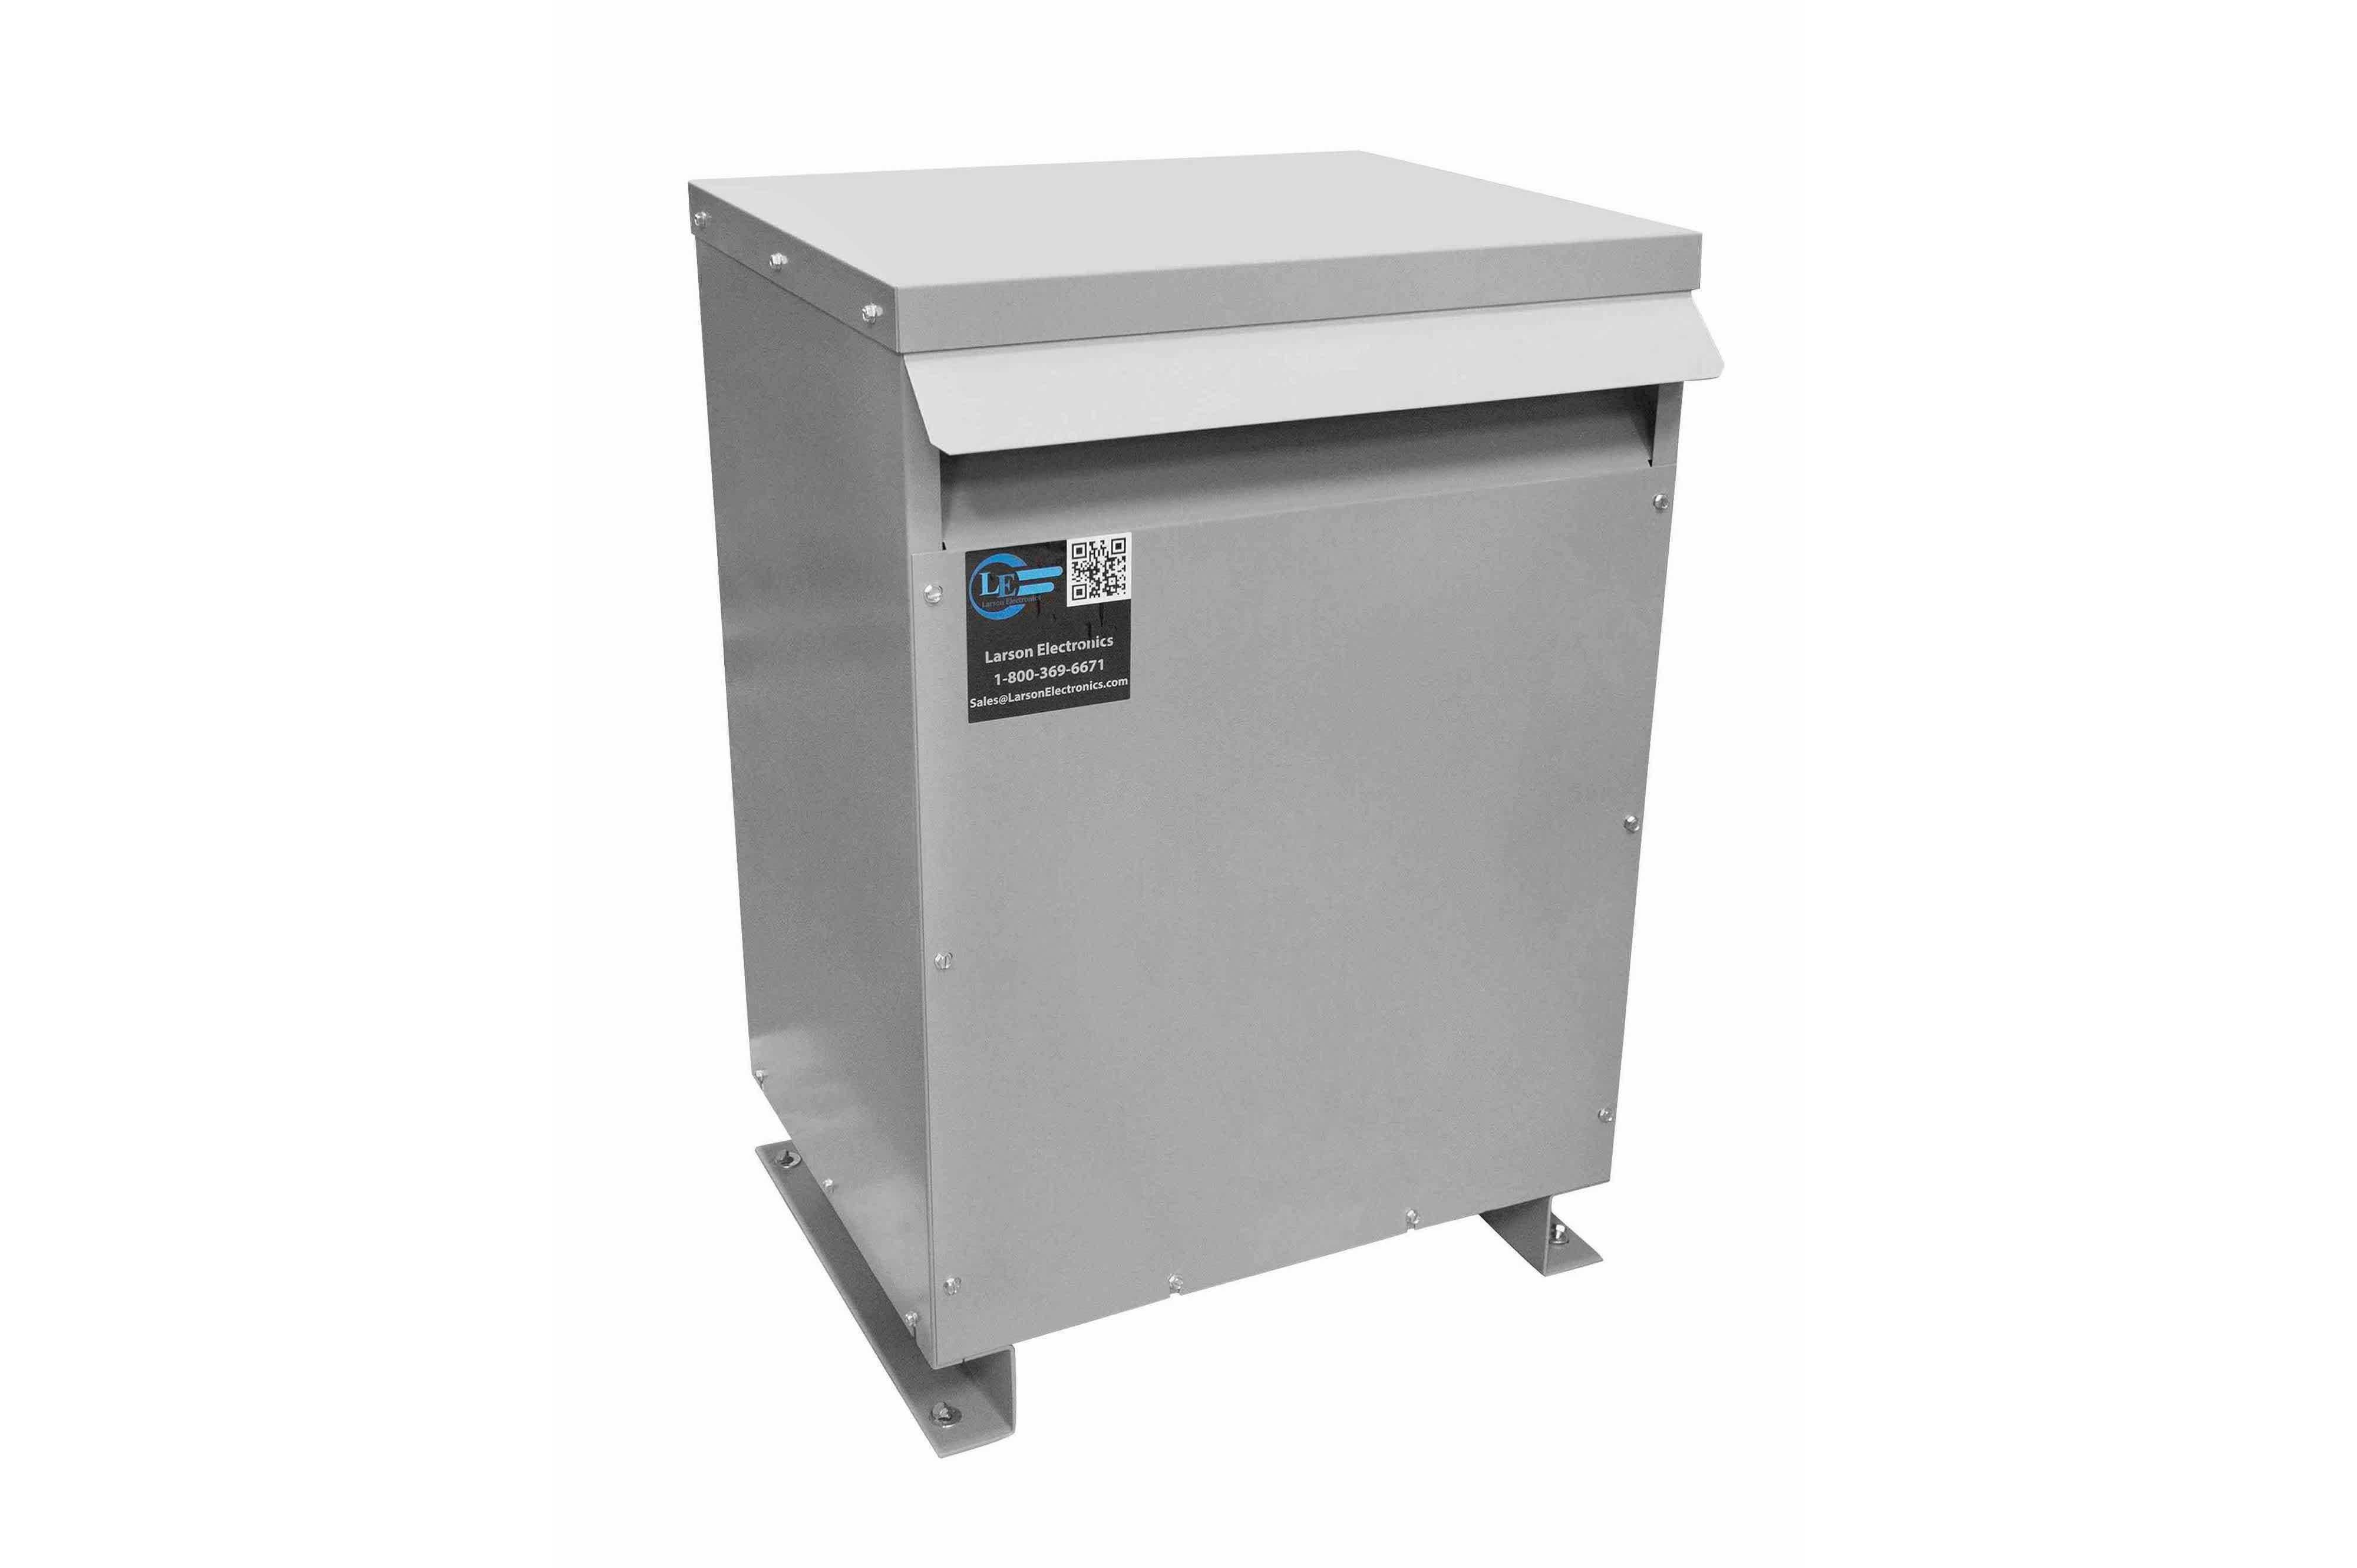 29 kVA 3PH Isolation Transformer, 208V Wye Primary, 415Y/240 Wye-N Secondary, N3R, Ventilated, 60 Hz